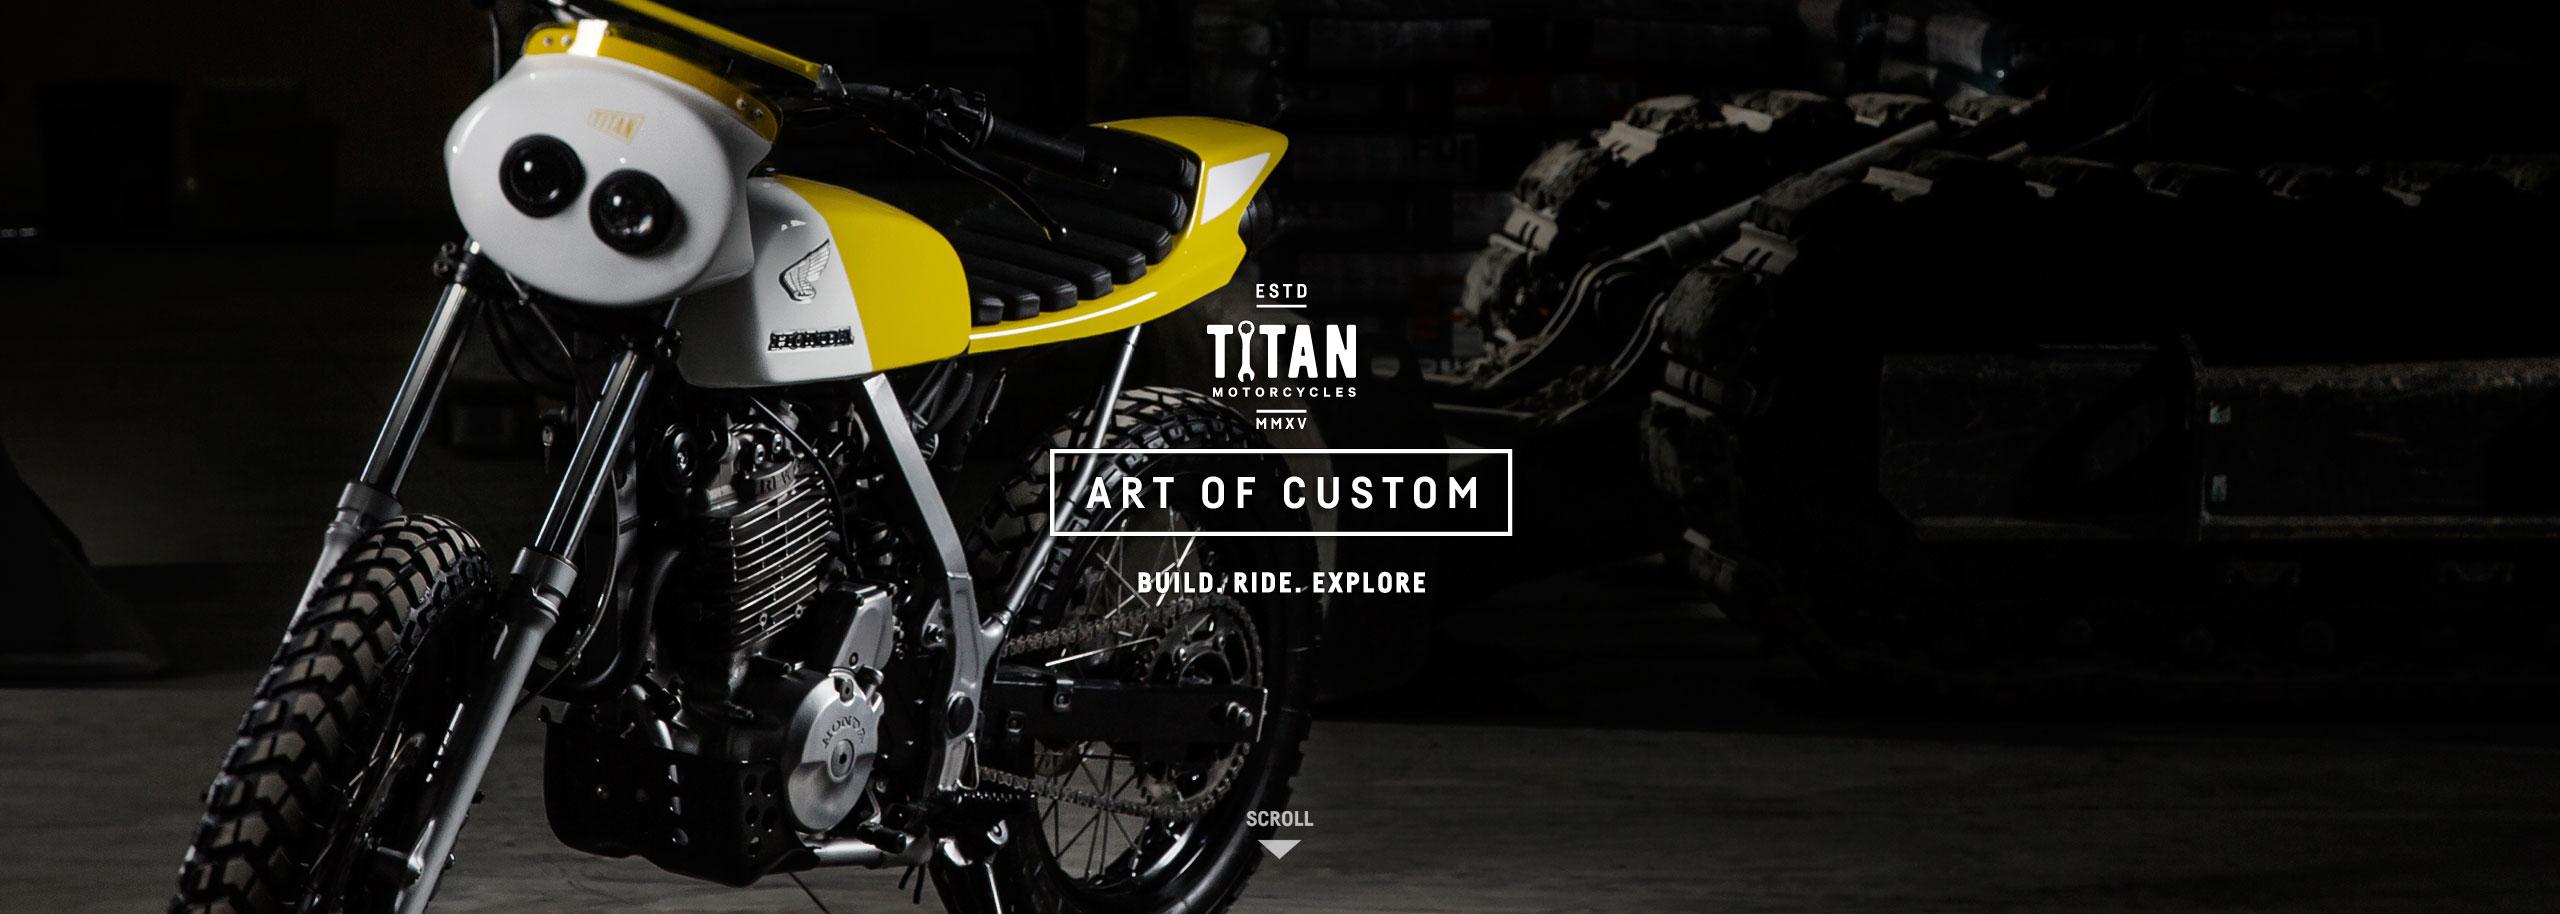 01_TITAN-Domina-Honda-Dominator-Umbau-Cafe-Racer-Graz-Motorrad-Umbau-Austria-Vintage_Custom-Bikes_Motorrad-Umbauten_Styrian-Design